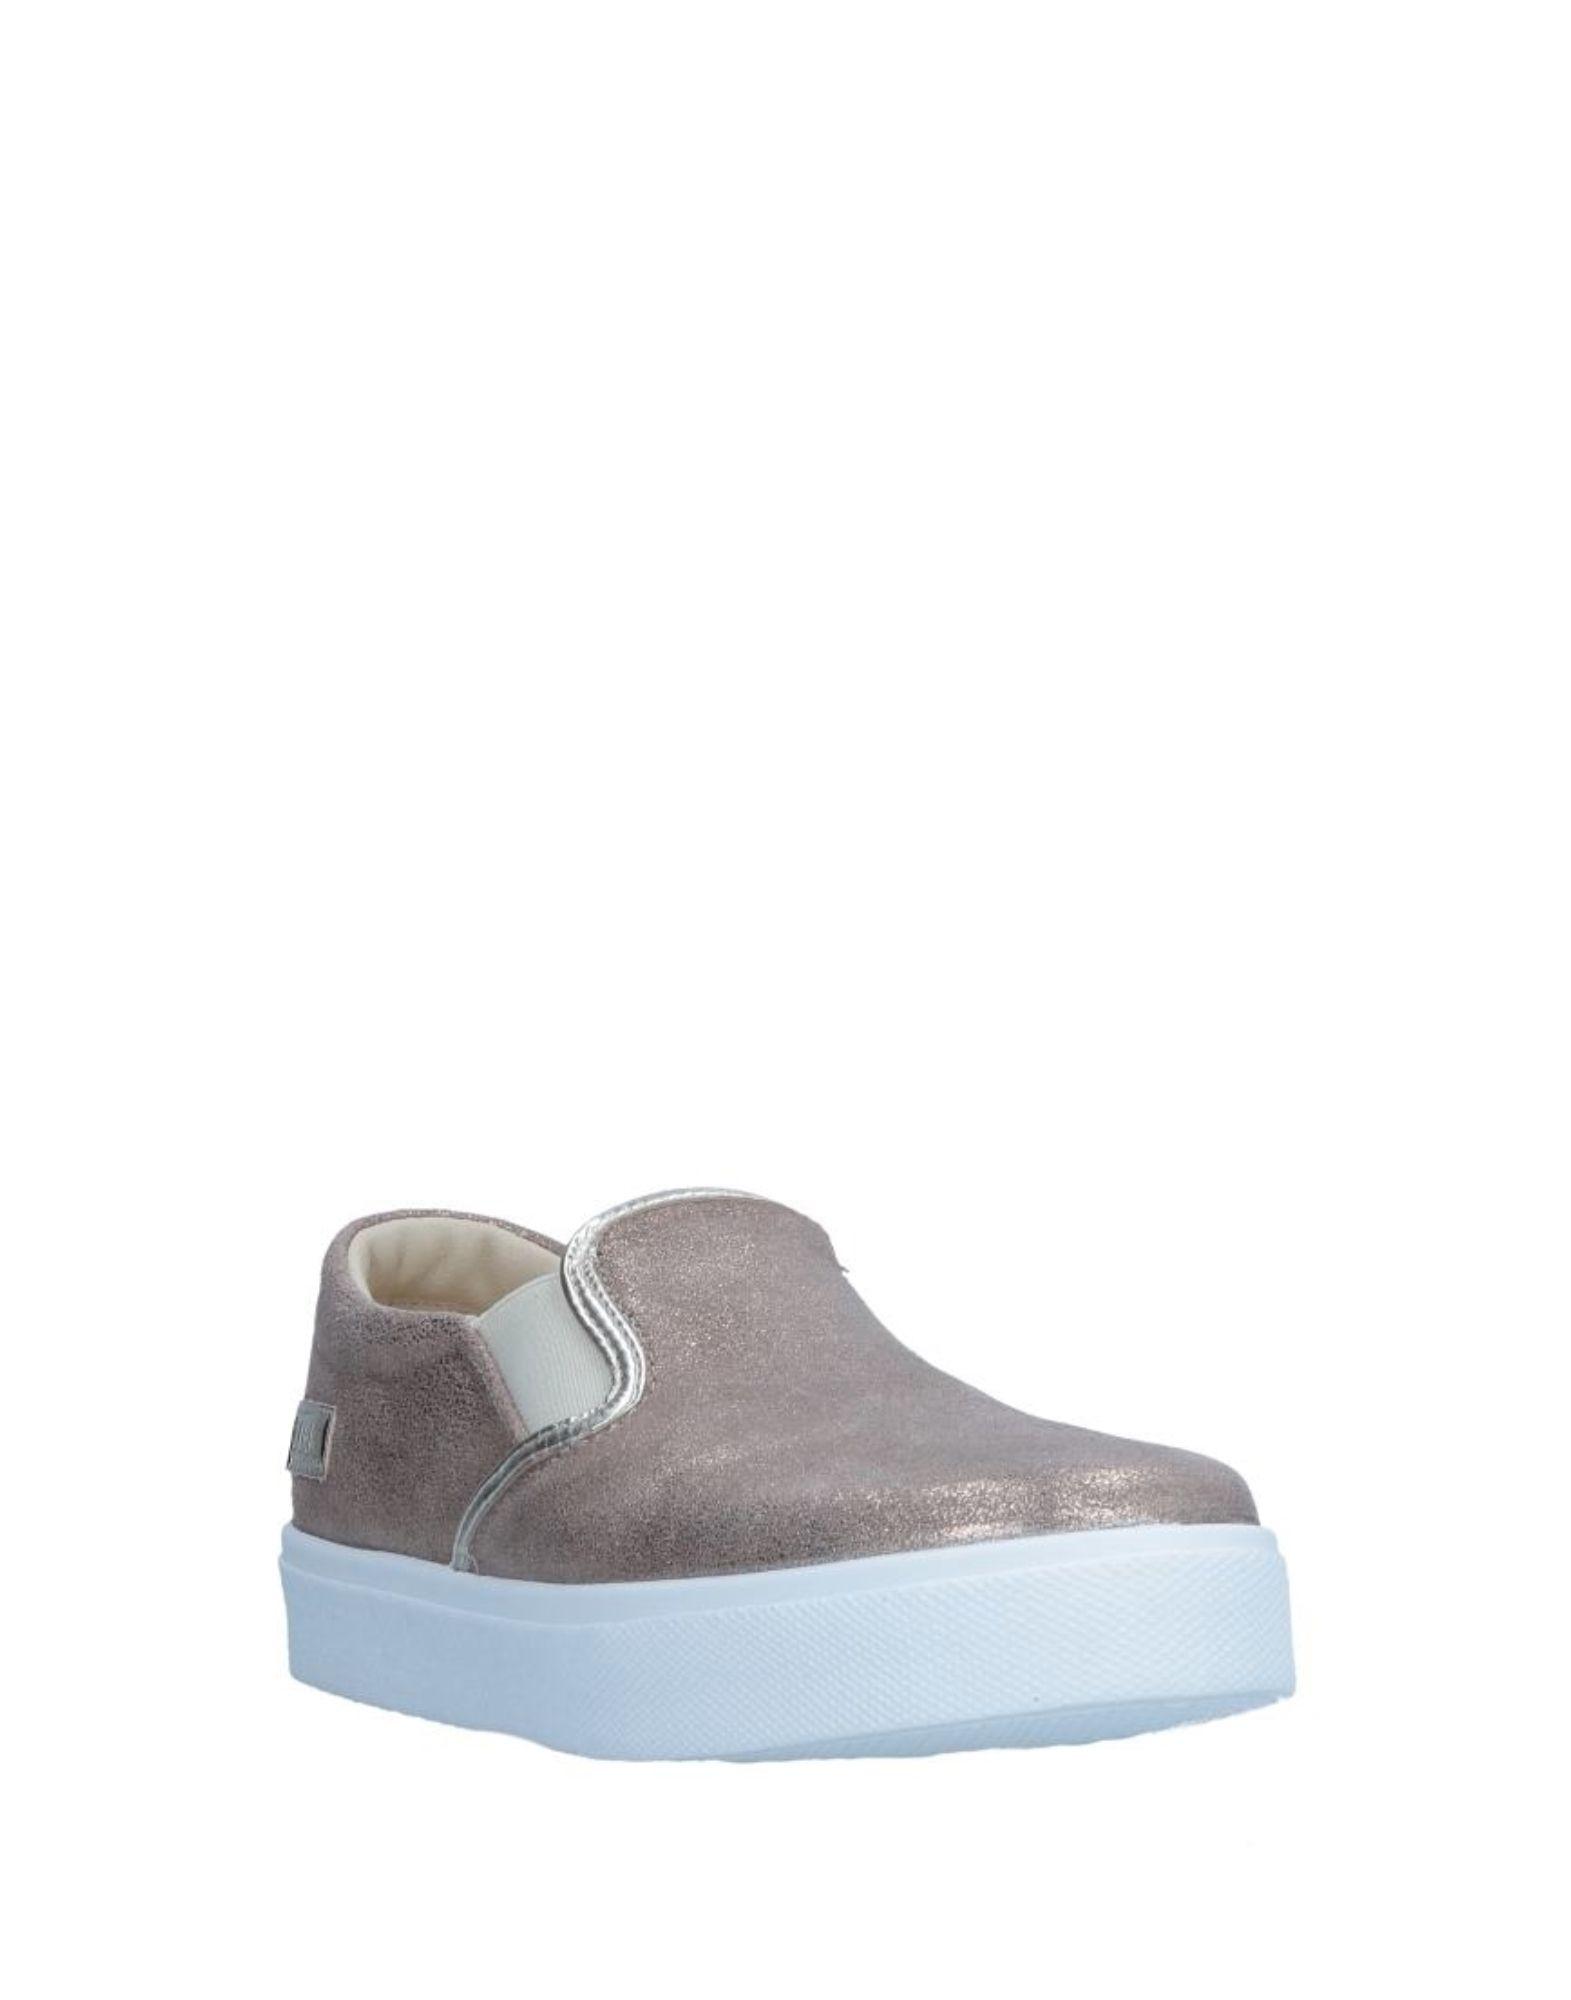 Liu Gute •Jo Shoes Sneakers Damen  11545865SM Gute Liu Qualität beliebte Schuhe 7d3916